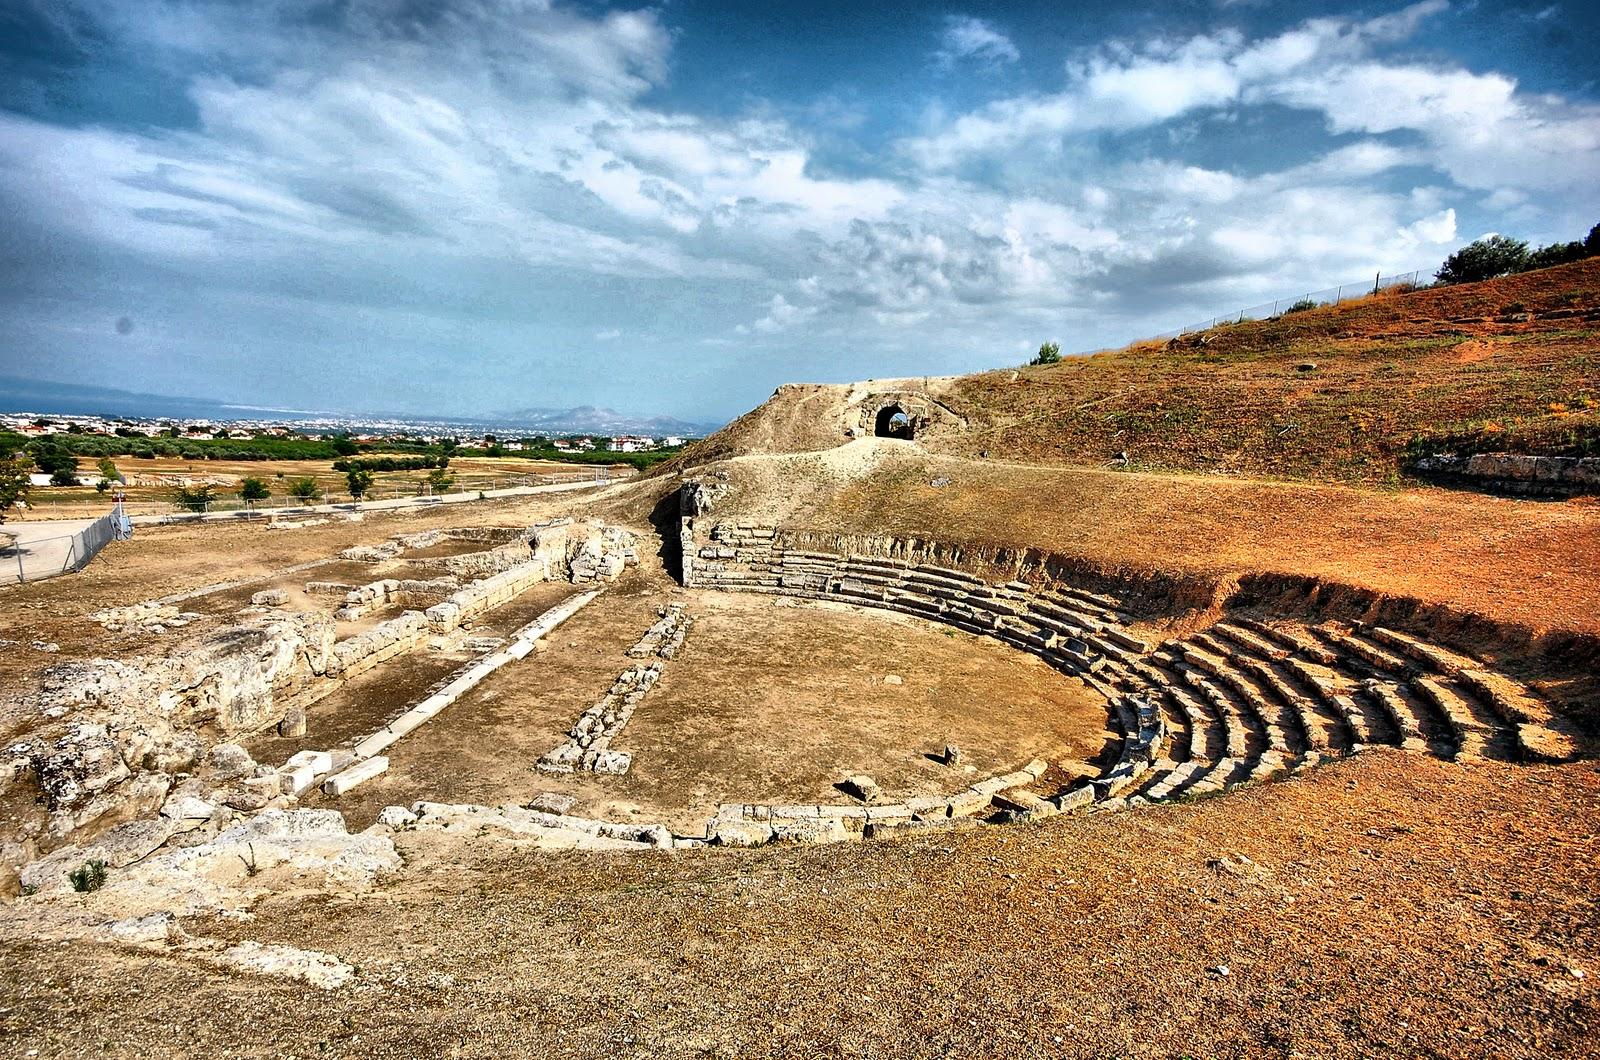 To Αρχαίο Θέατρο Σικυώνας σε μία μοναδική τοποθεσία -